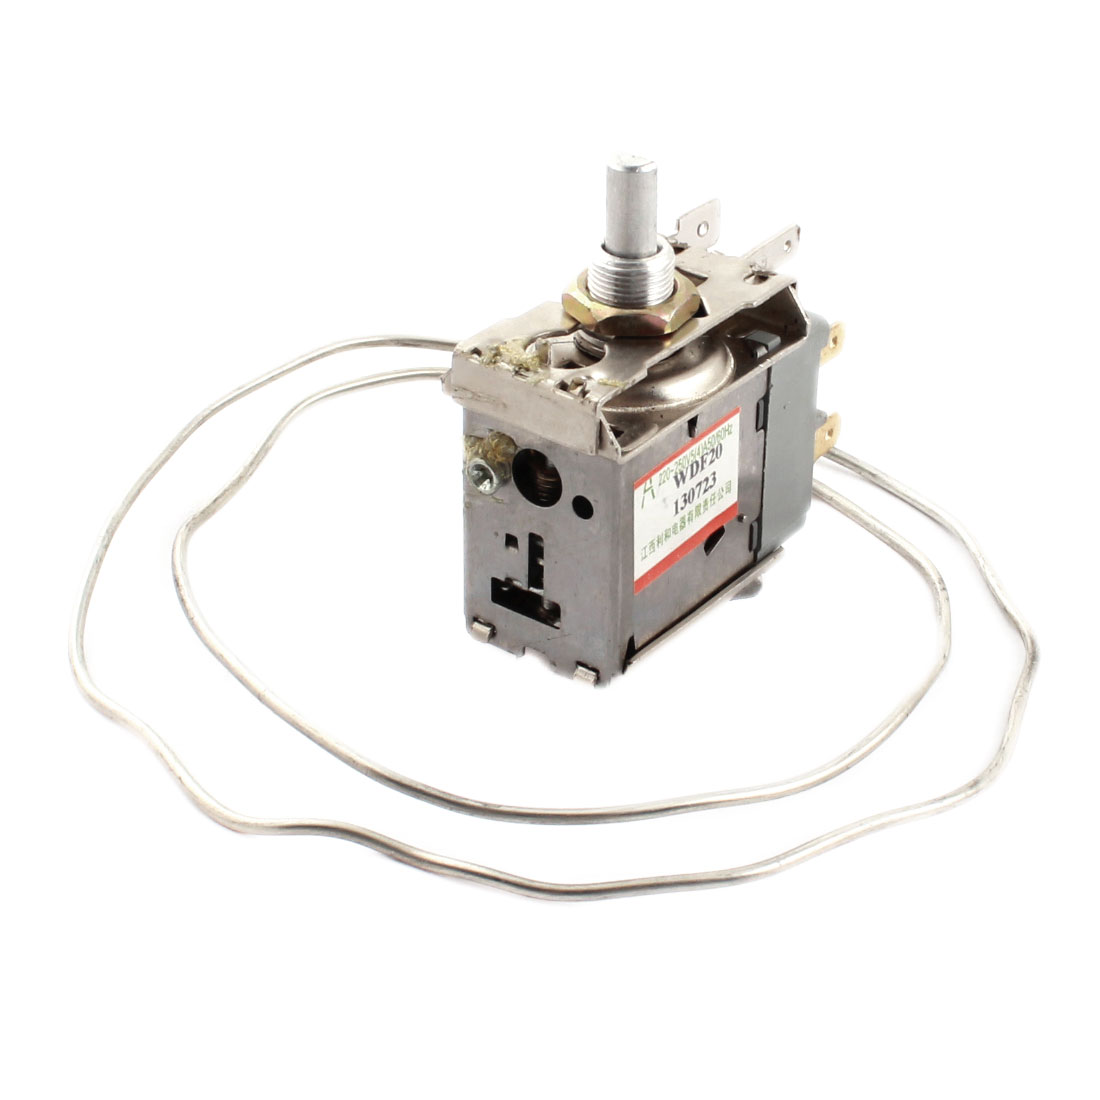 WDF20 AC 220-250V Refrigerator Refrigeration Thermostat w 65cm Metal Cord